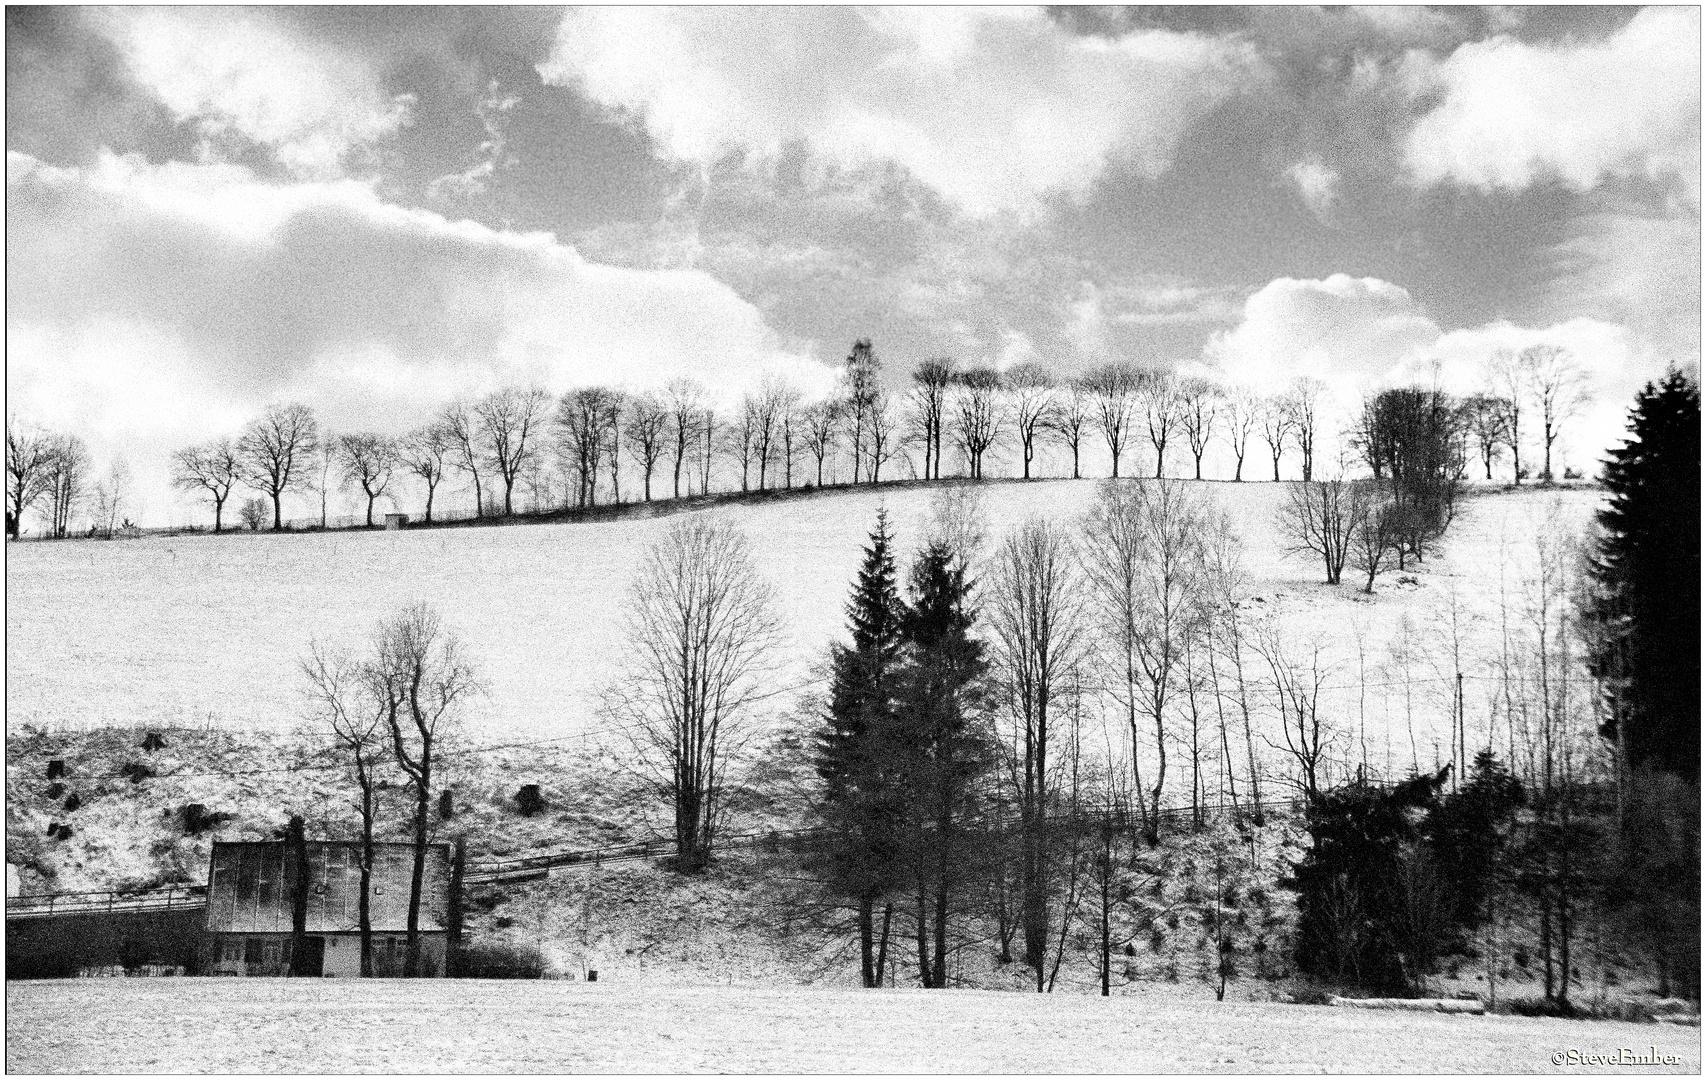 Erzgebirge Winter - No. 2